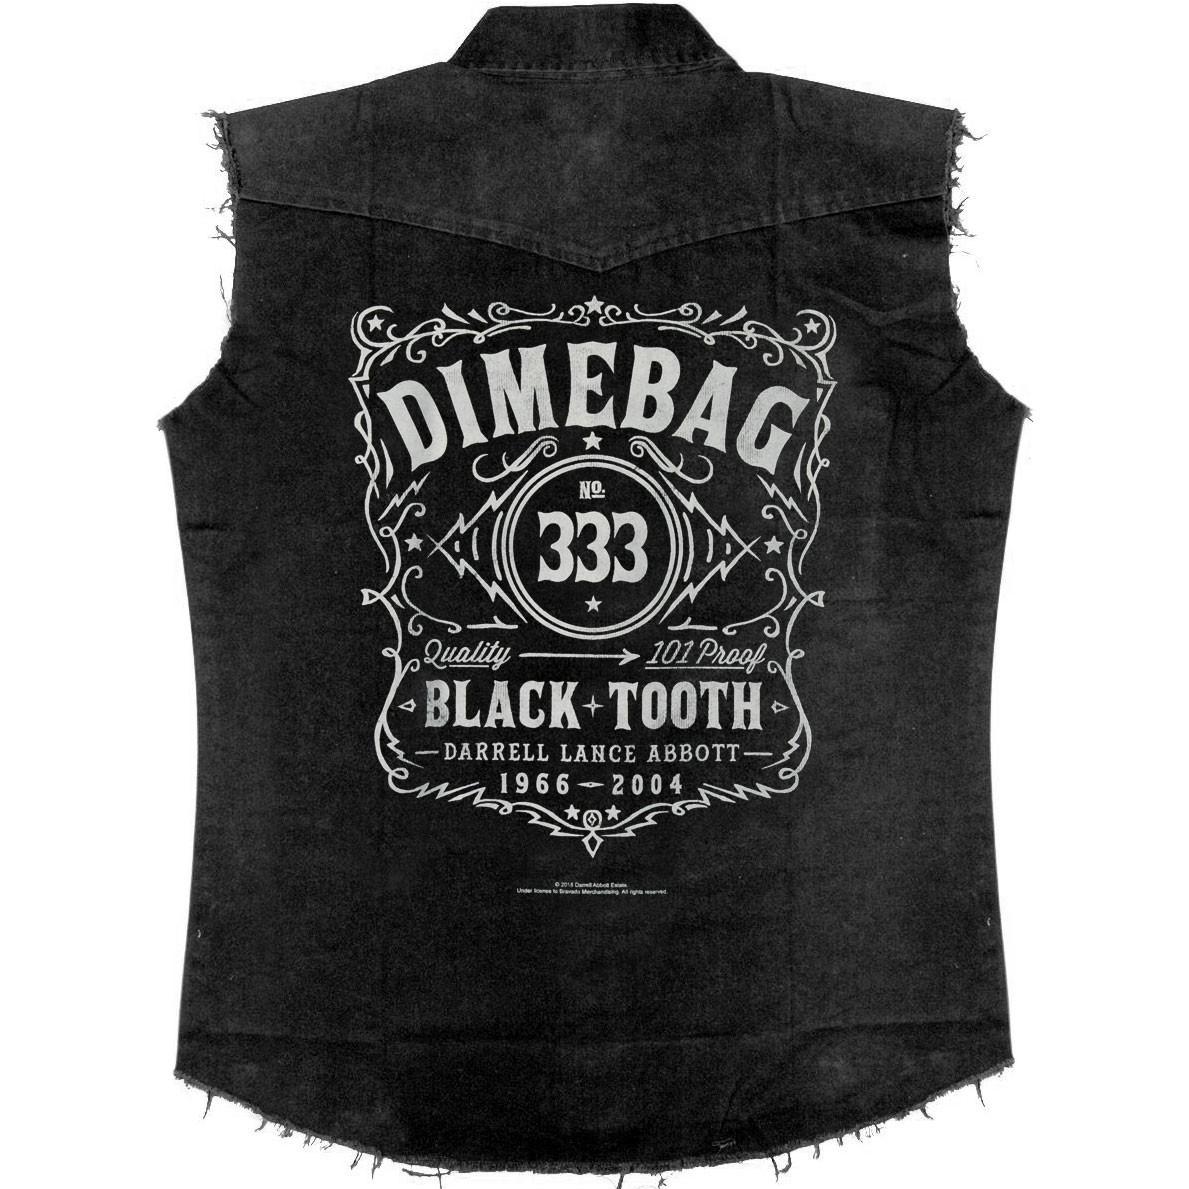 Dimebag Darrell Black Tooth Work Shirt